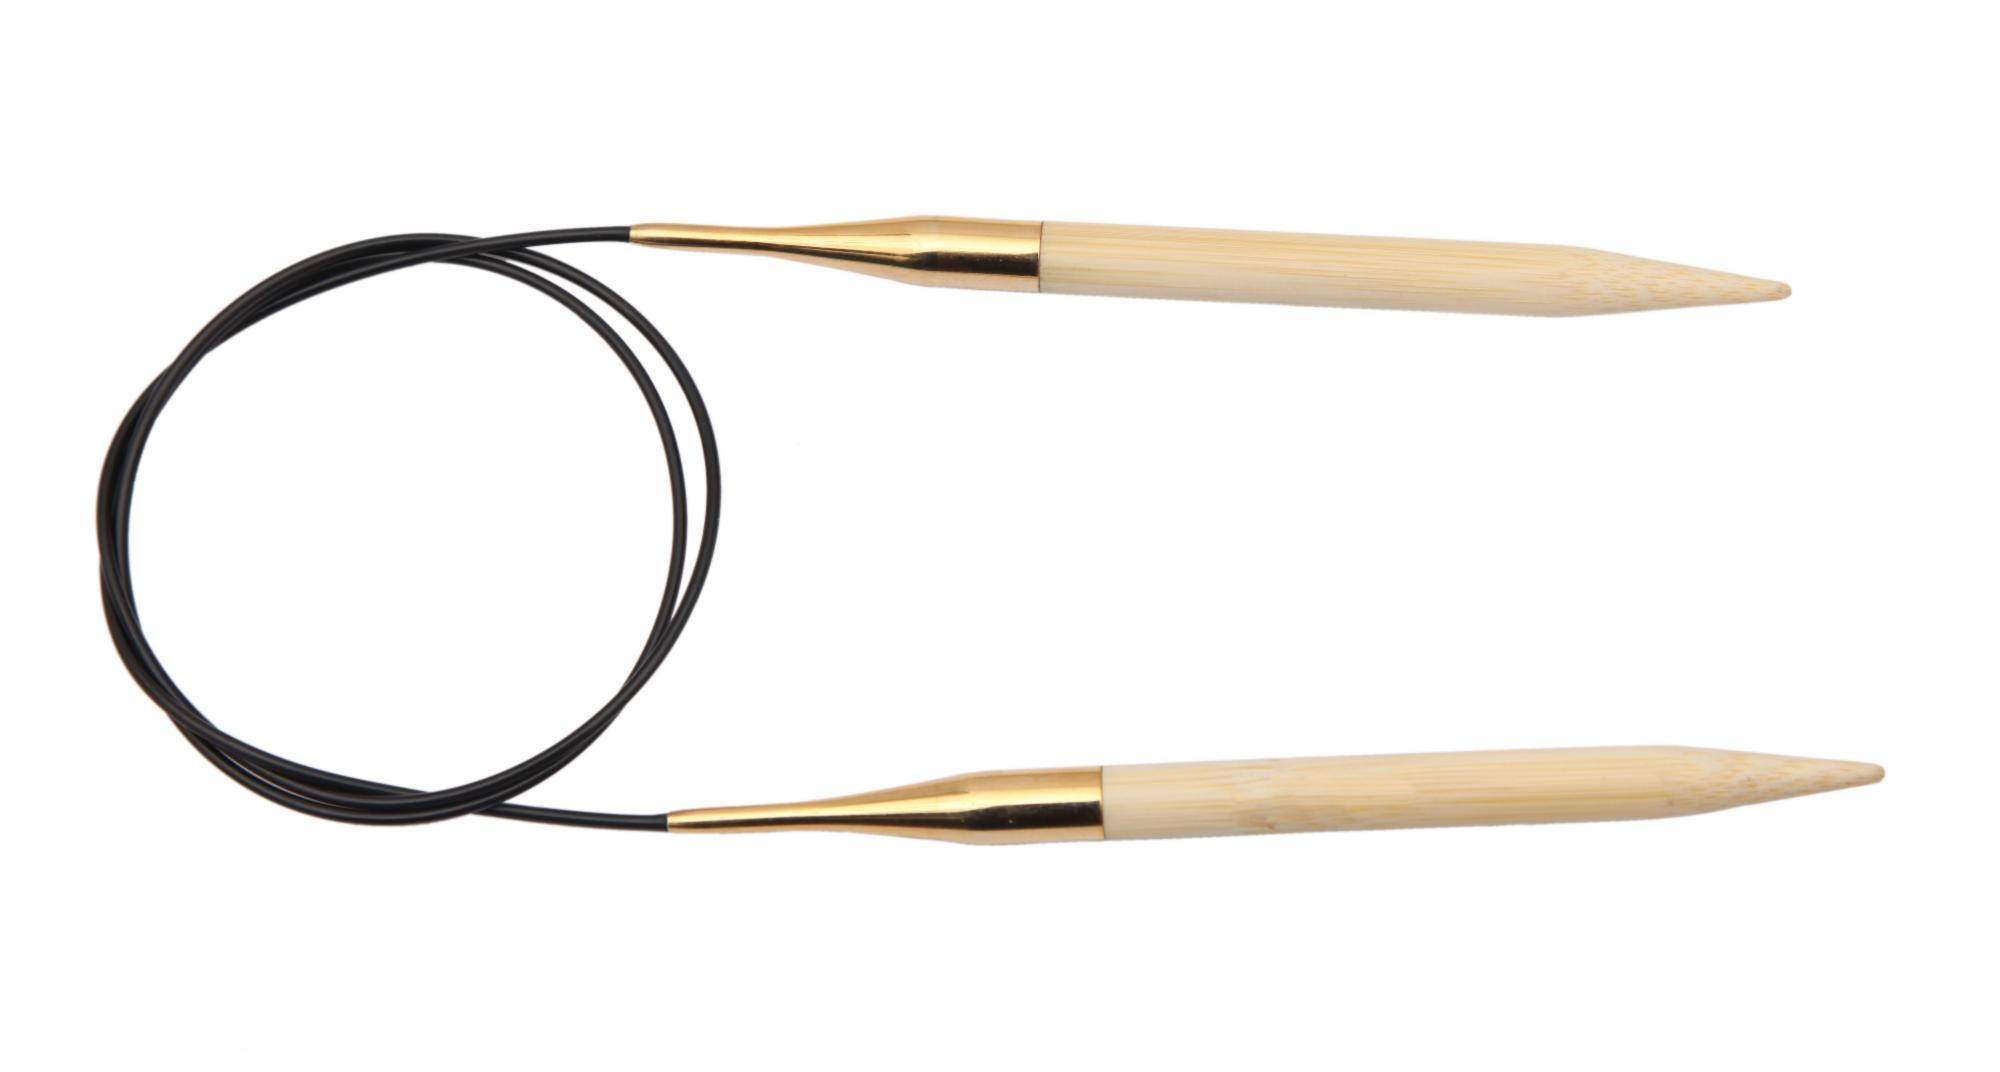 Спицы круговые 60 см Bamboo KnitPro, 22226, 3.50 мм